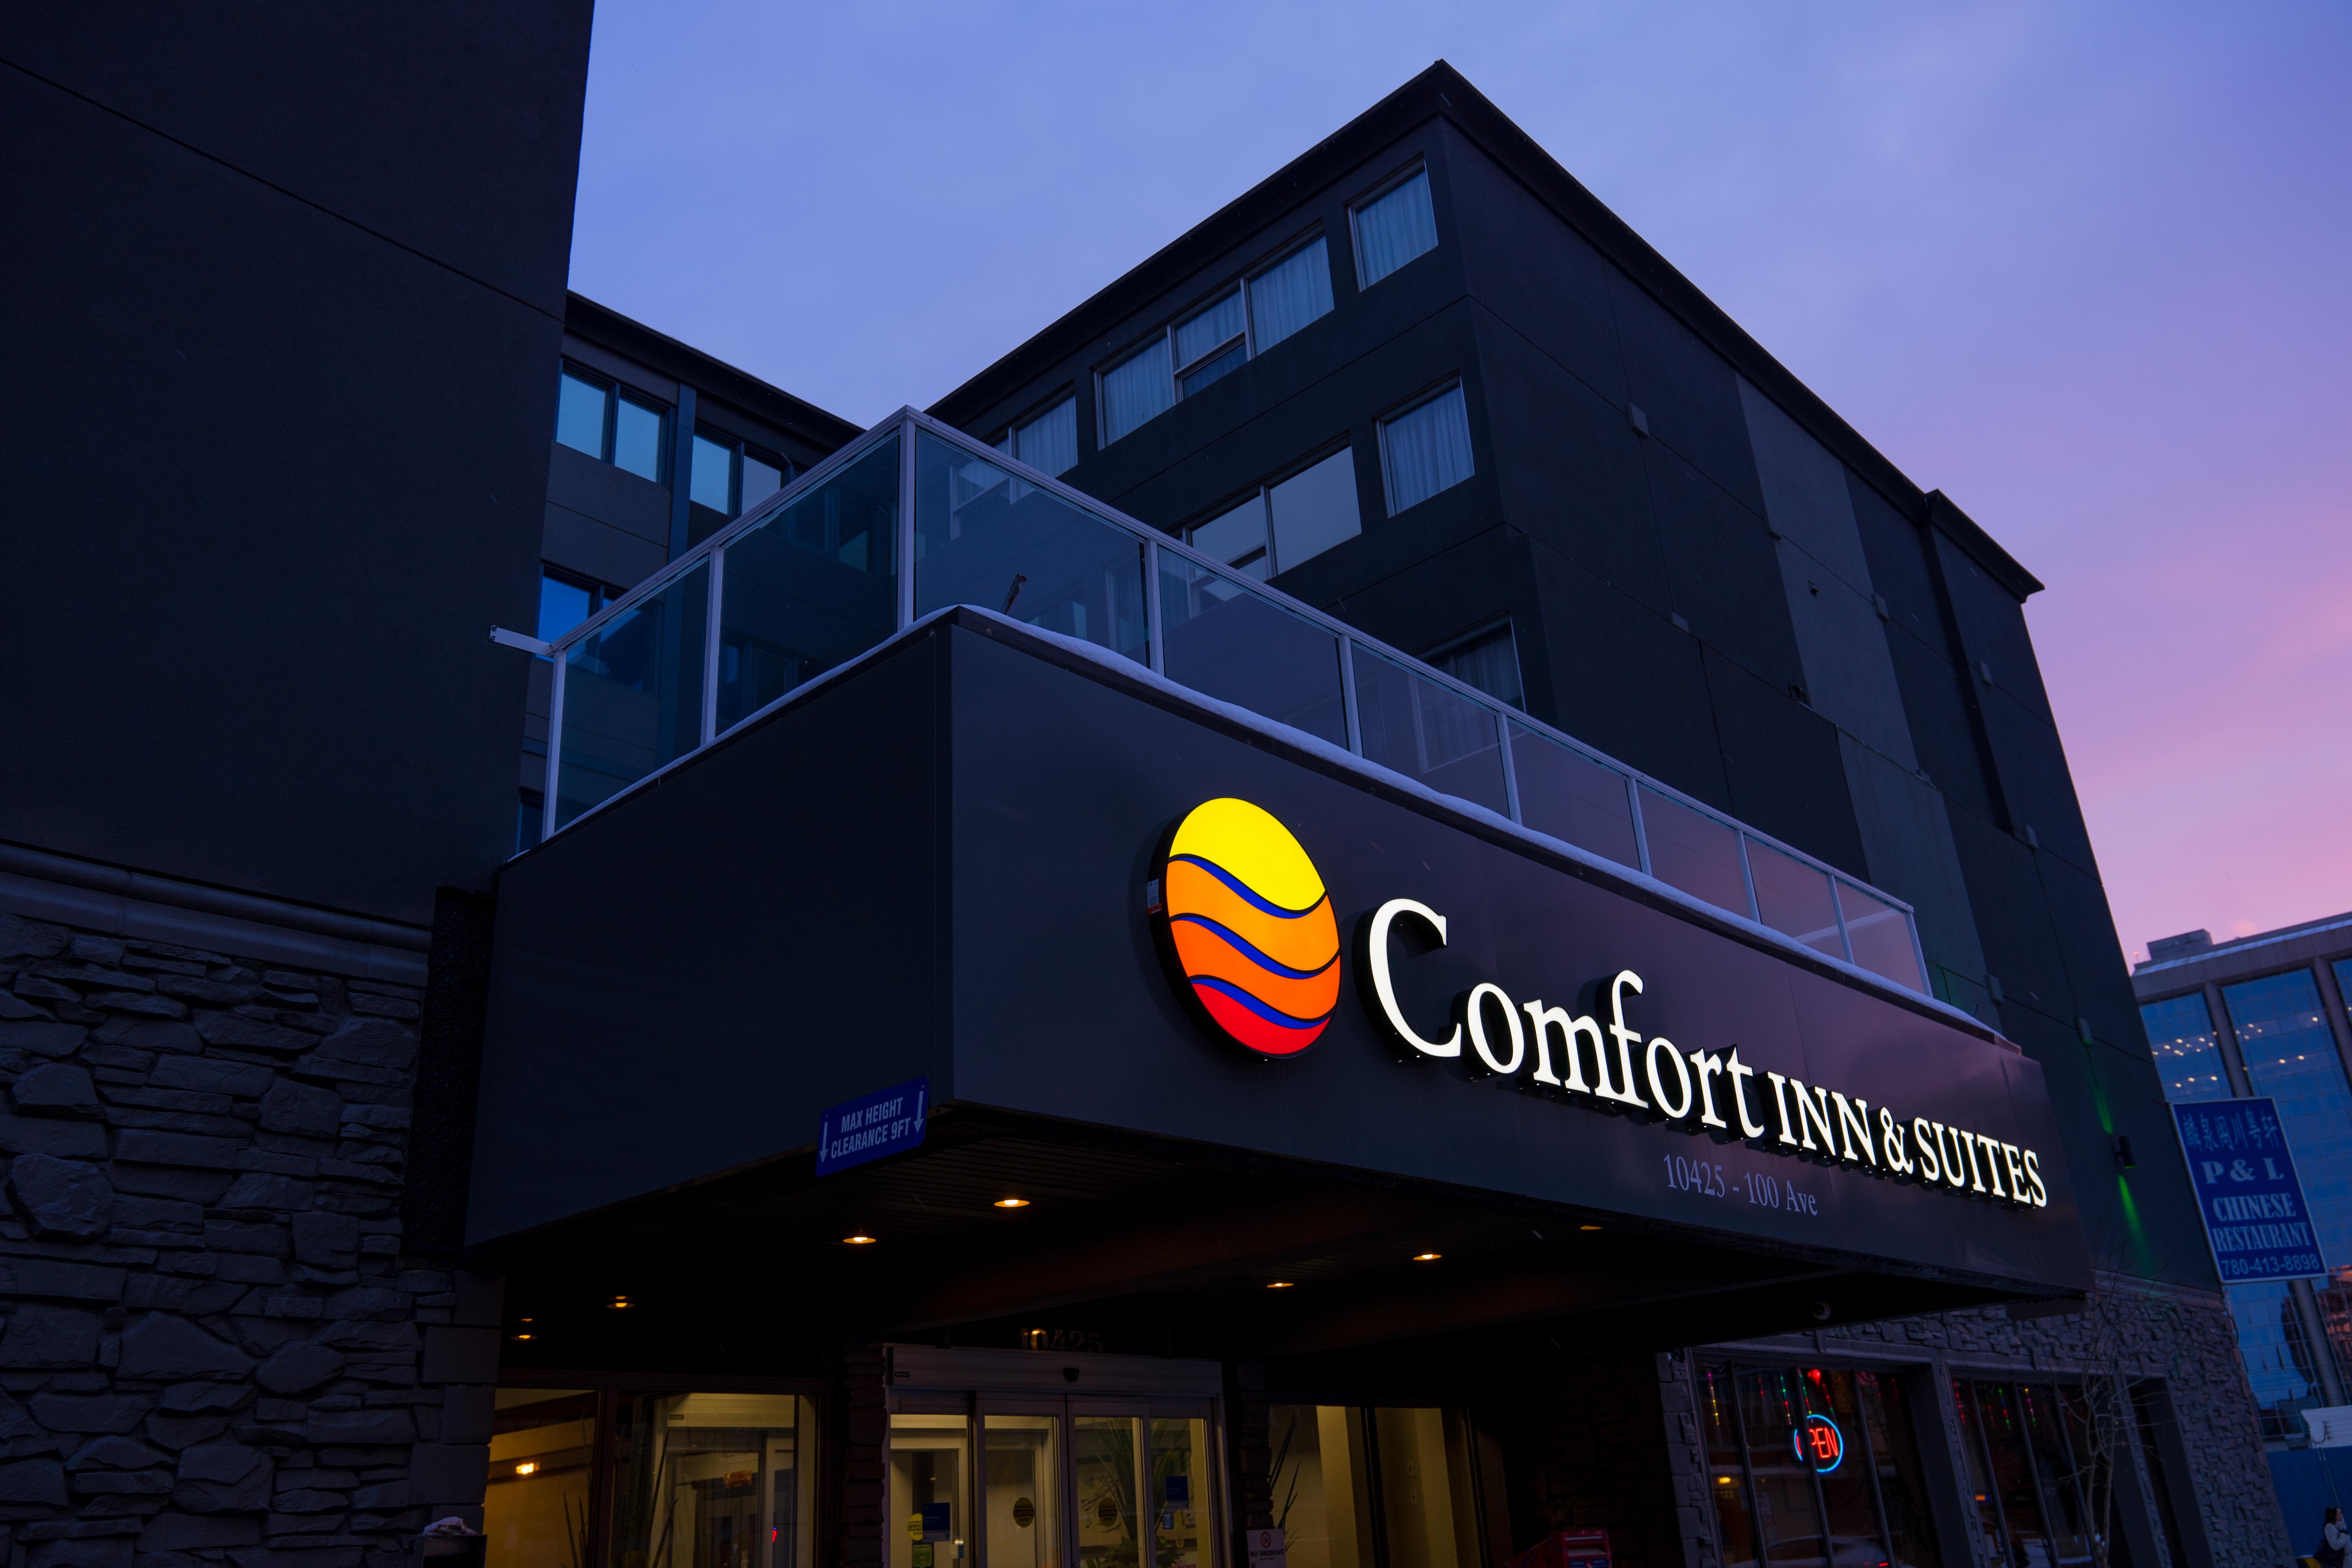 Comfort Inn & Suites Edmonton, Division No. 11